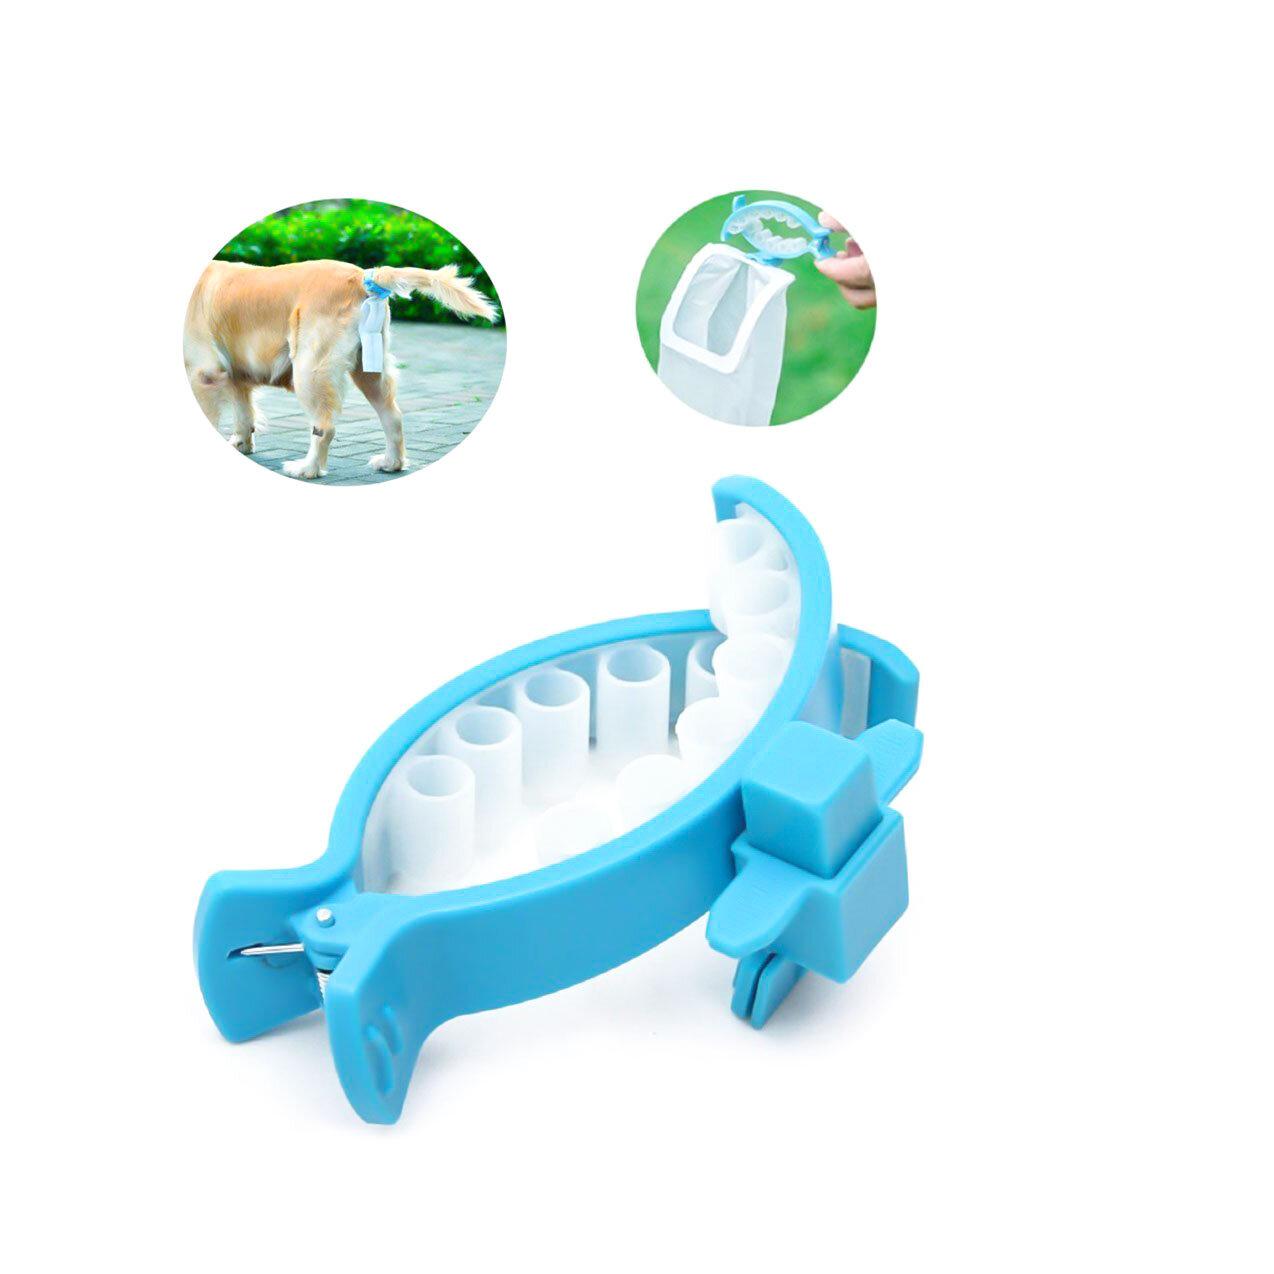 Evcil hayvan Köpek Outdoor Pooper Scoopers Clip Pet Outdoor Seyahat Su Geçirmez Tuvalet Köpek Taşınabilir Tuvalet